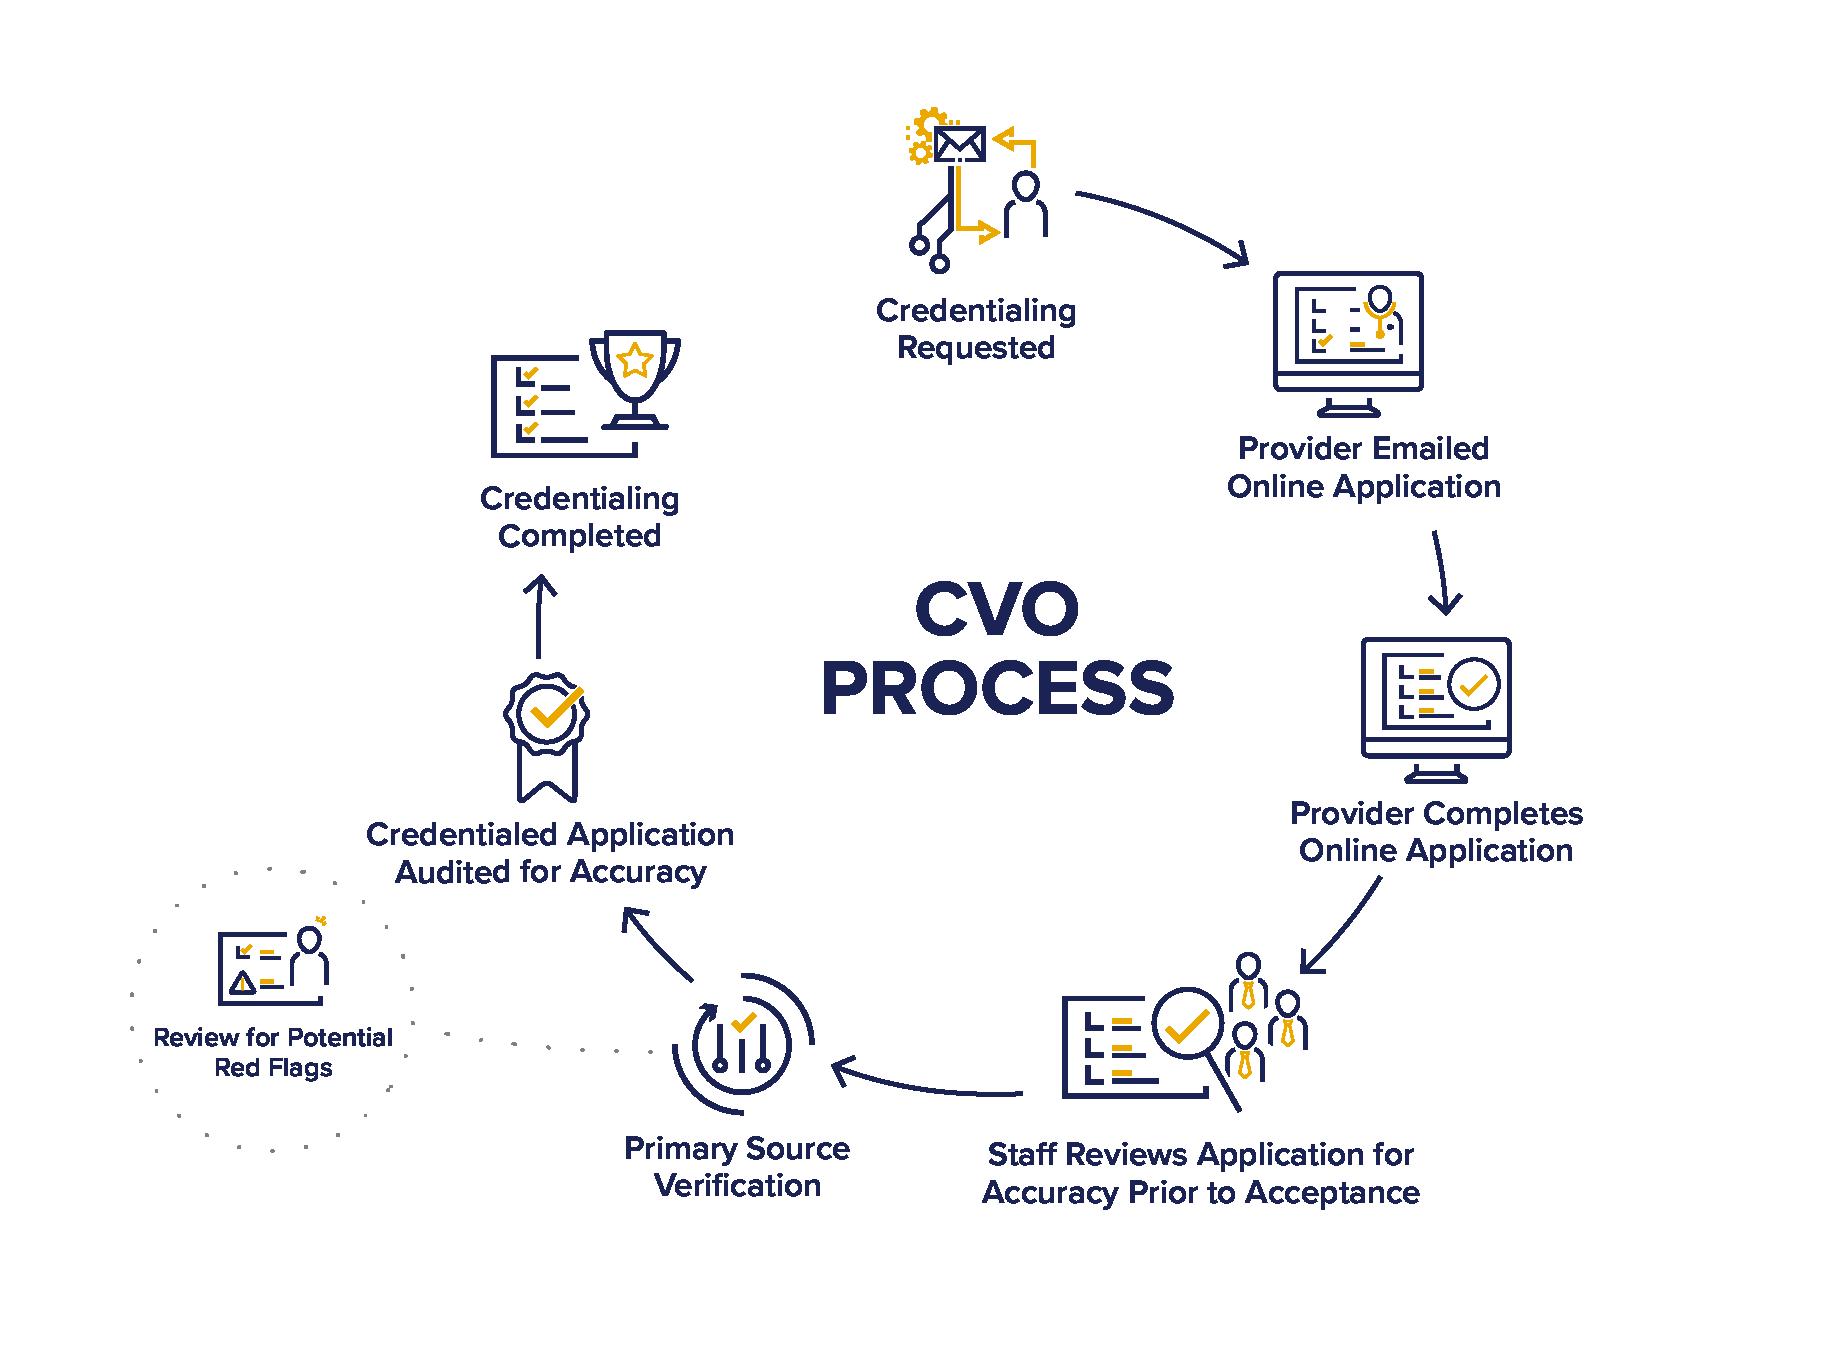 VerityStream CVO Services Process